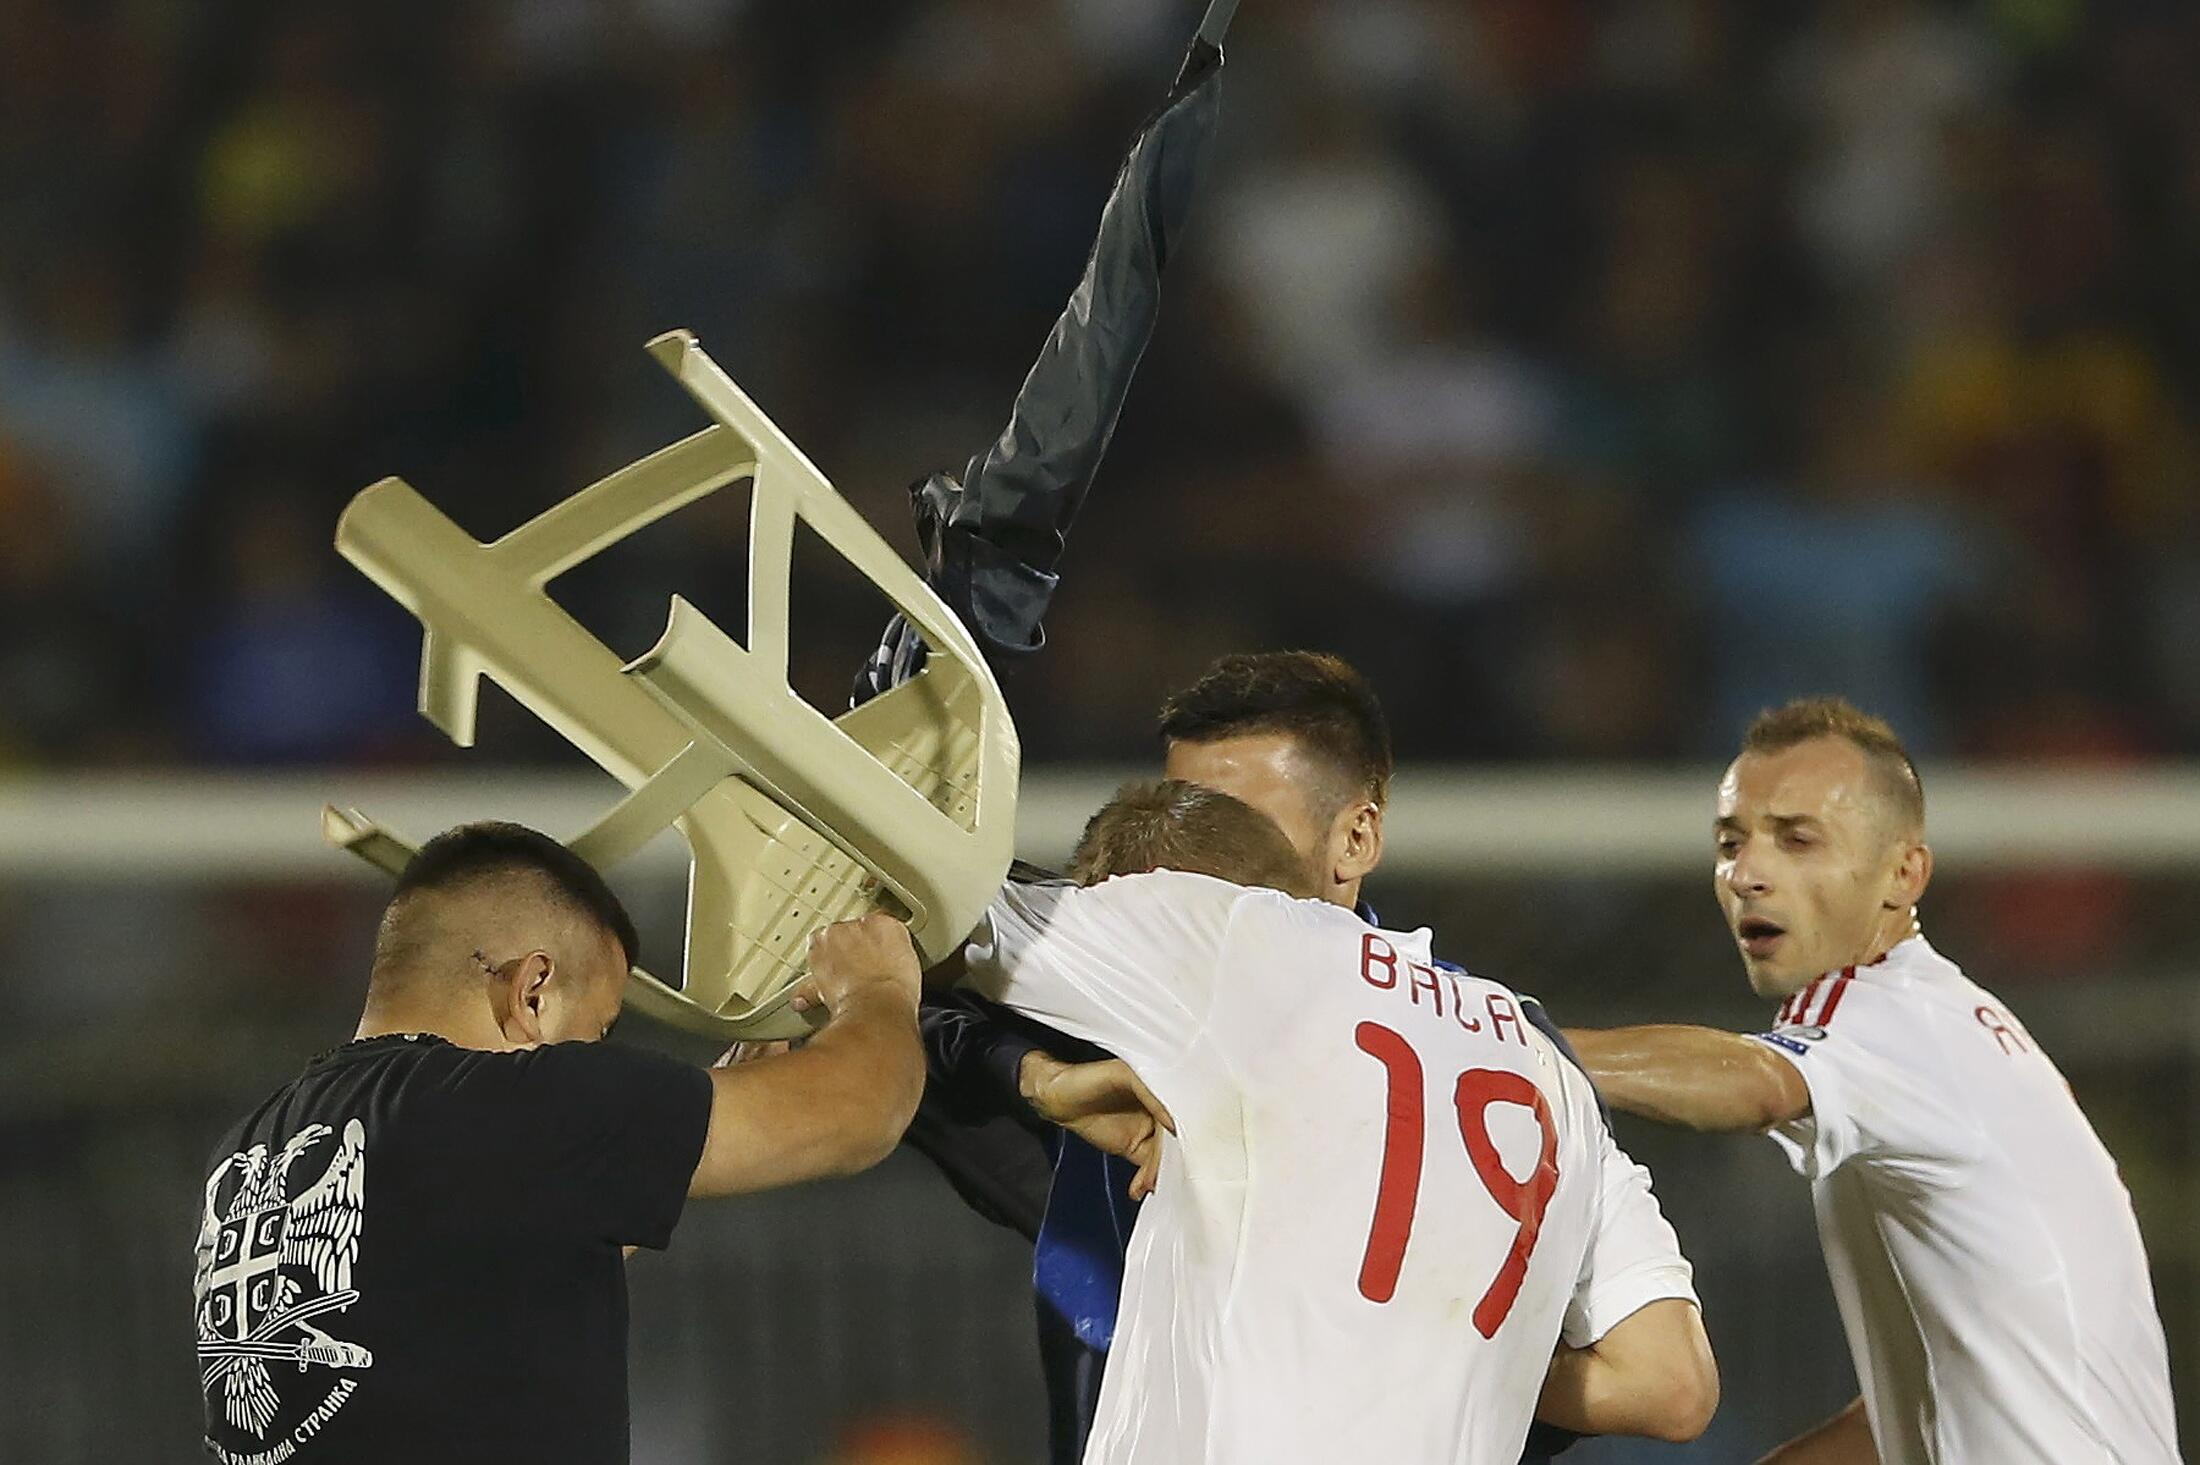 Partida foi interrompida no primeiro tempo, depois de confrontos entre torcedores e jogadores.